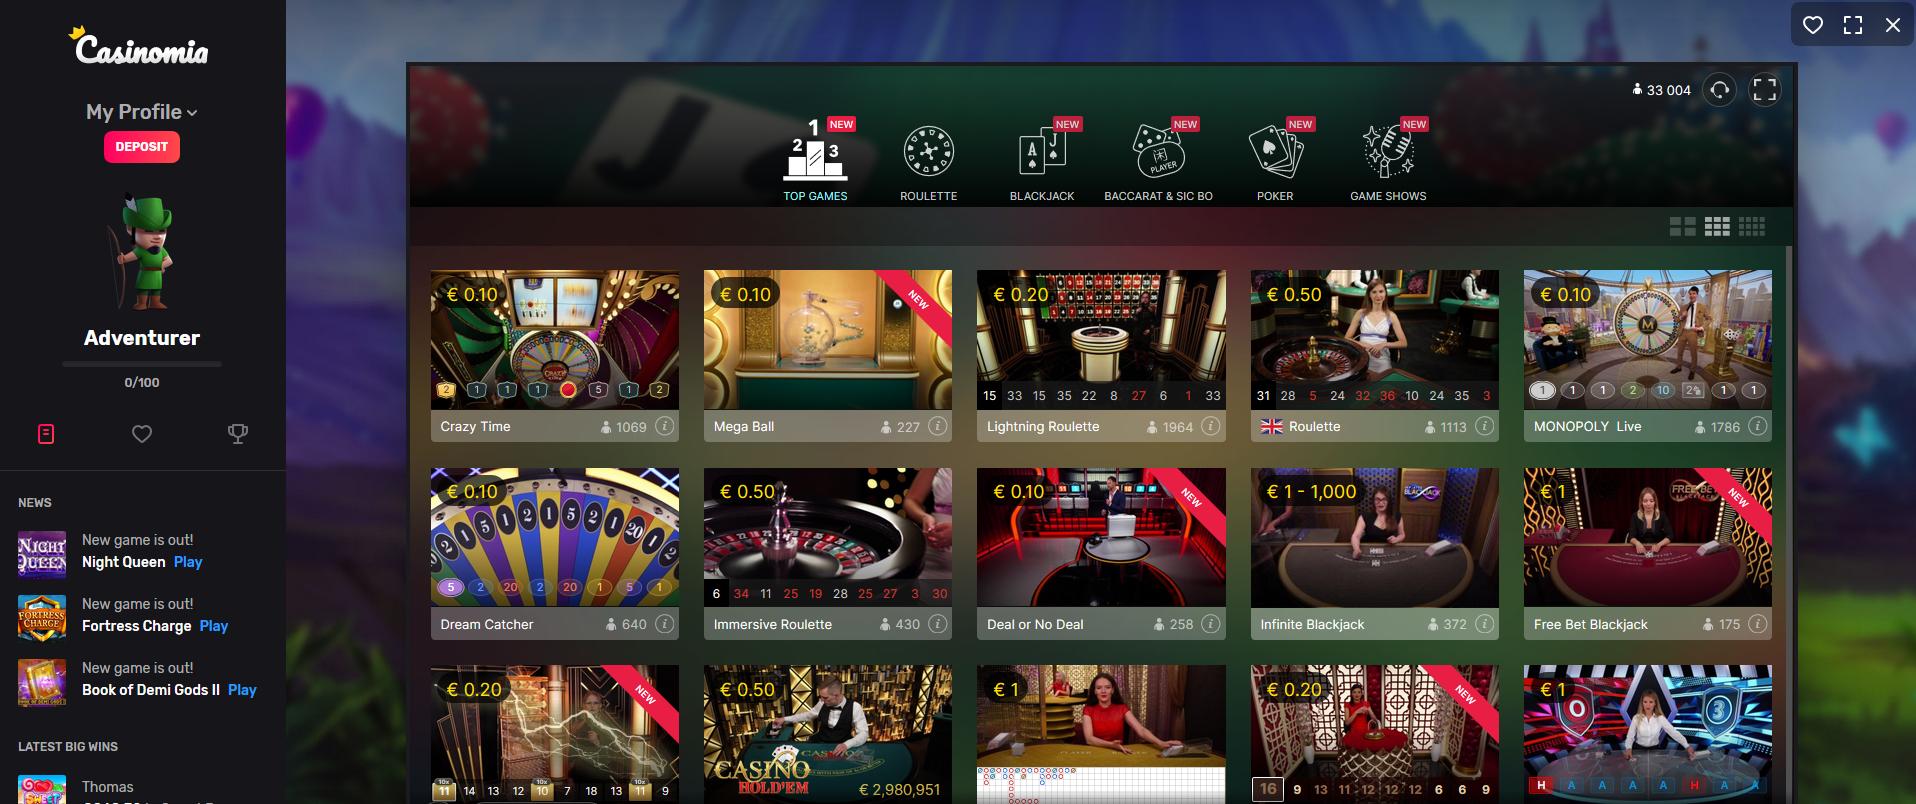 casinomia live casino - evolution gaming mega ball lightning roulette infinite blackjack dream catcher monopoly live